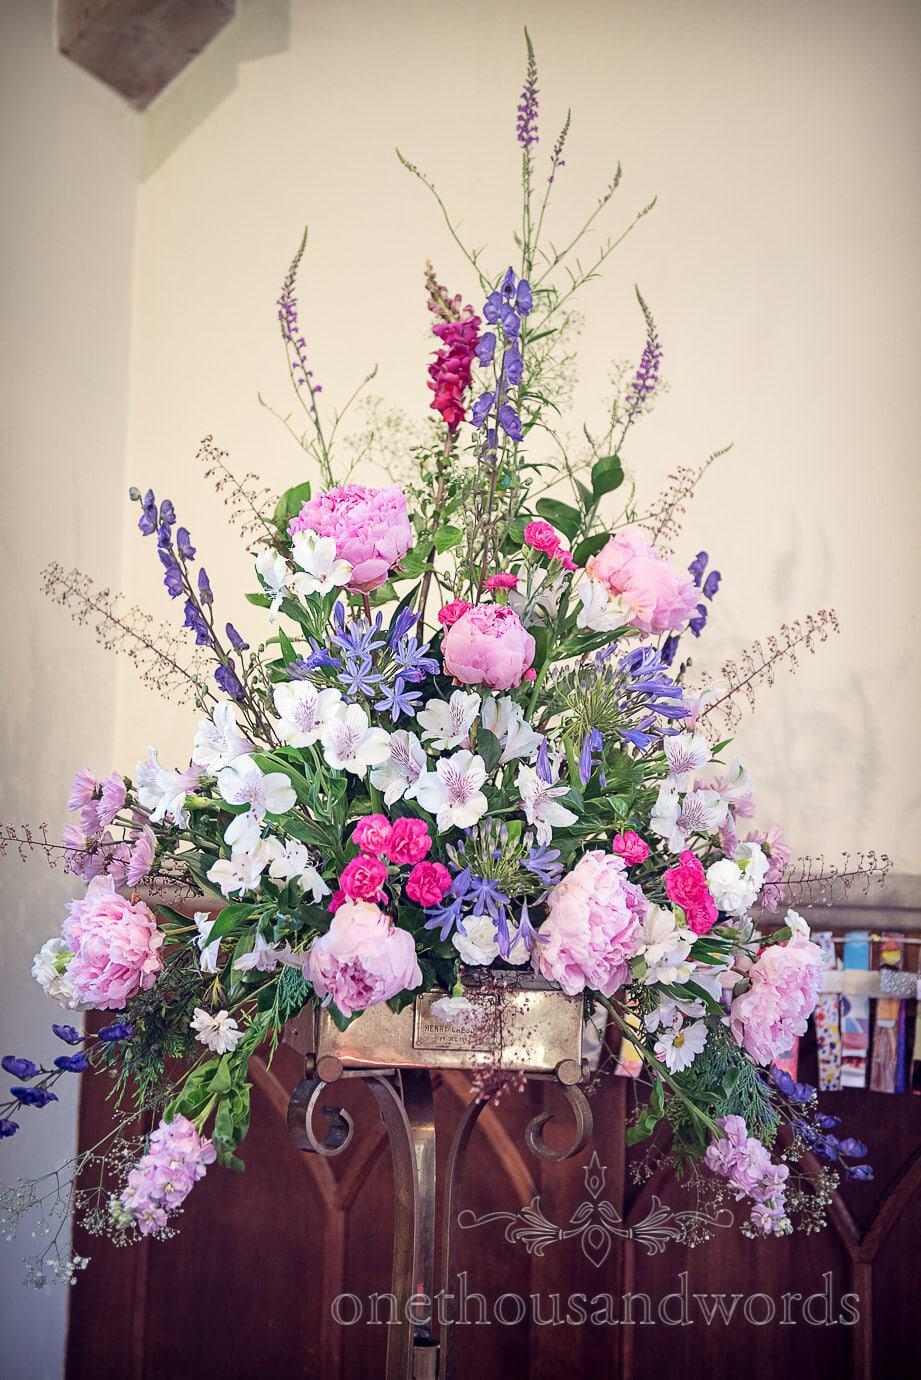 Pastel wedding flowers dispay in church by Wildberry Flowers, Dorset